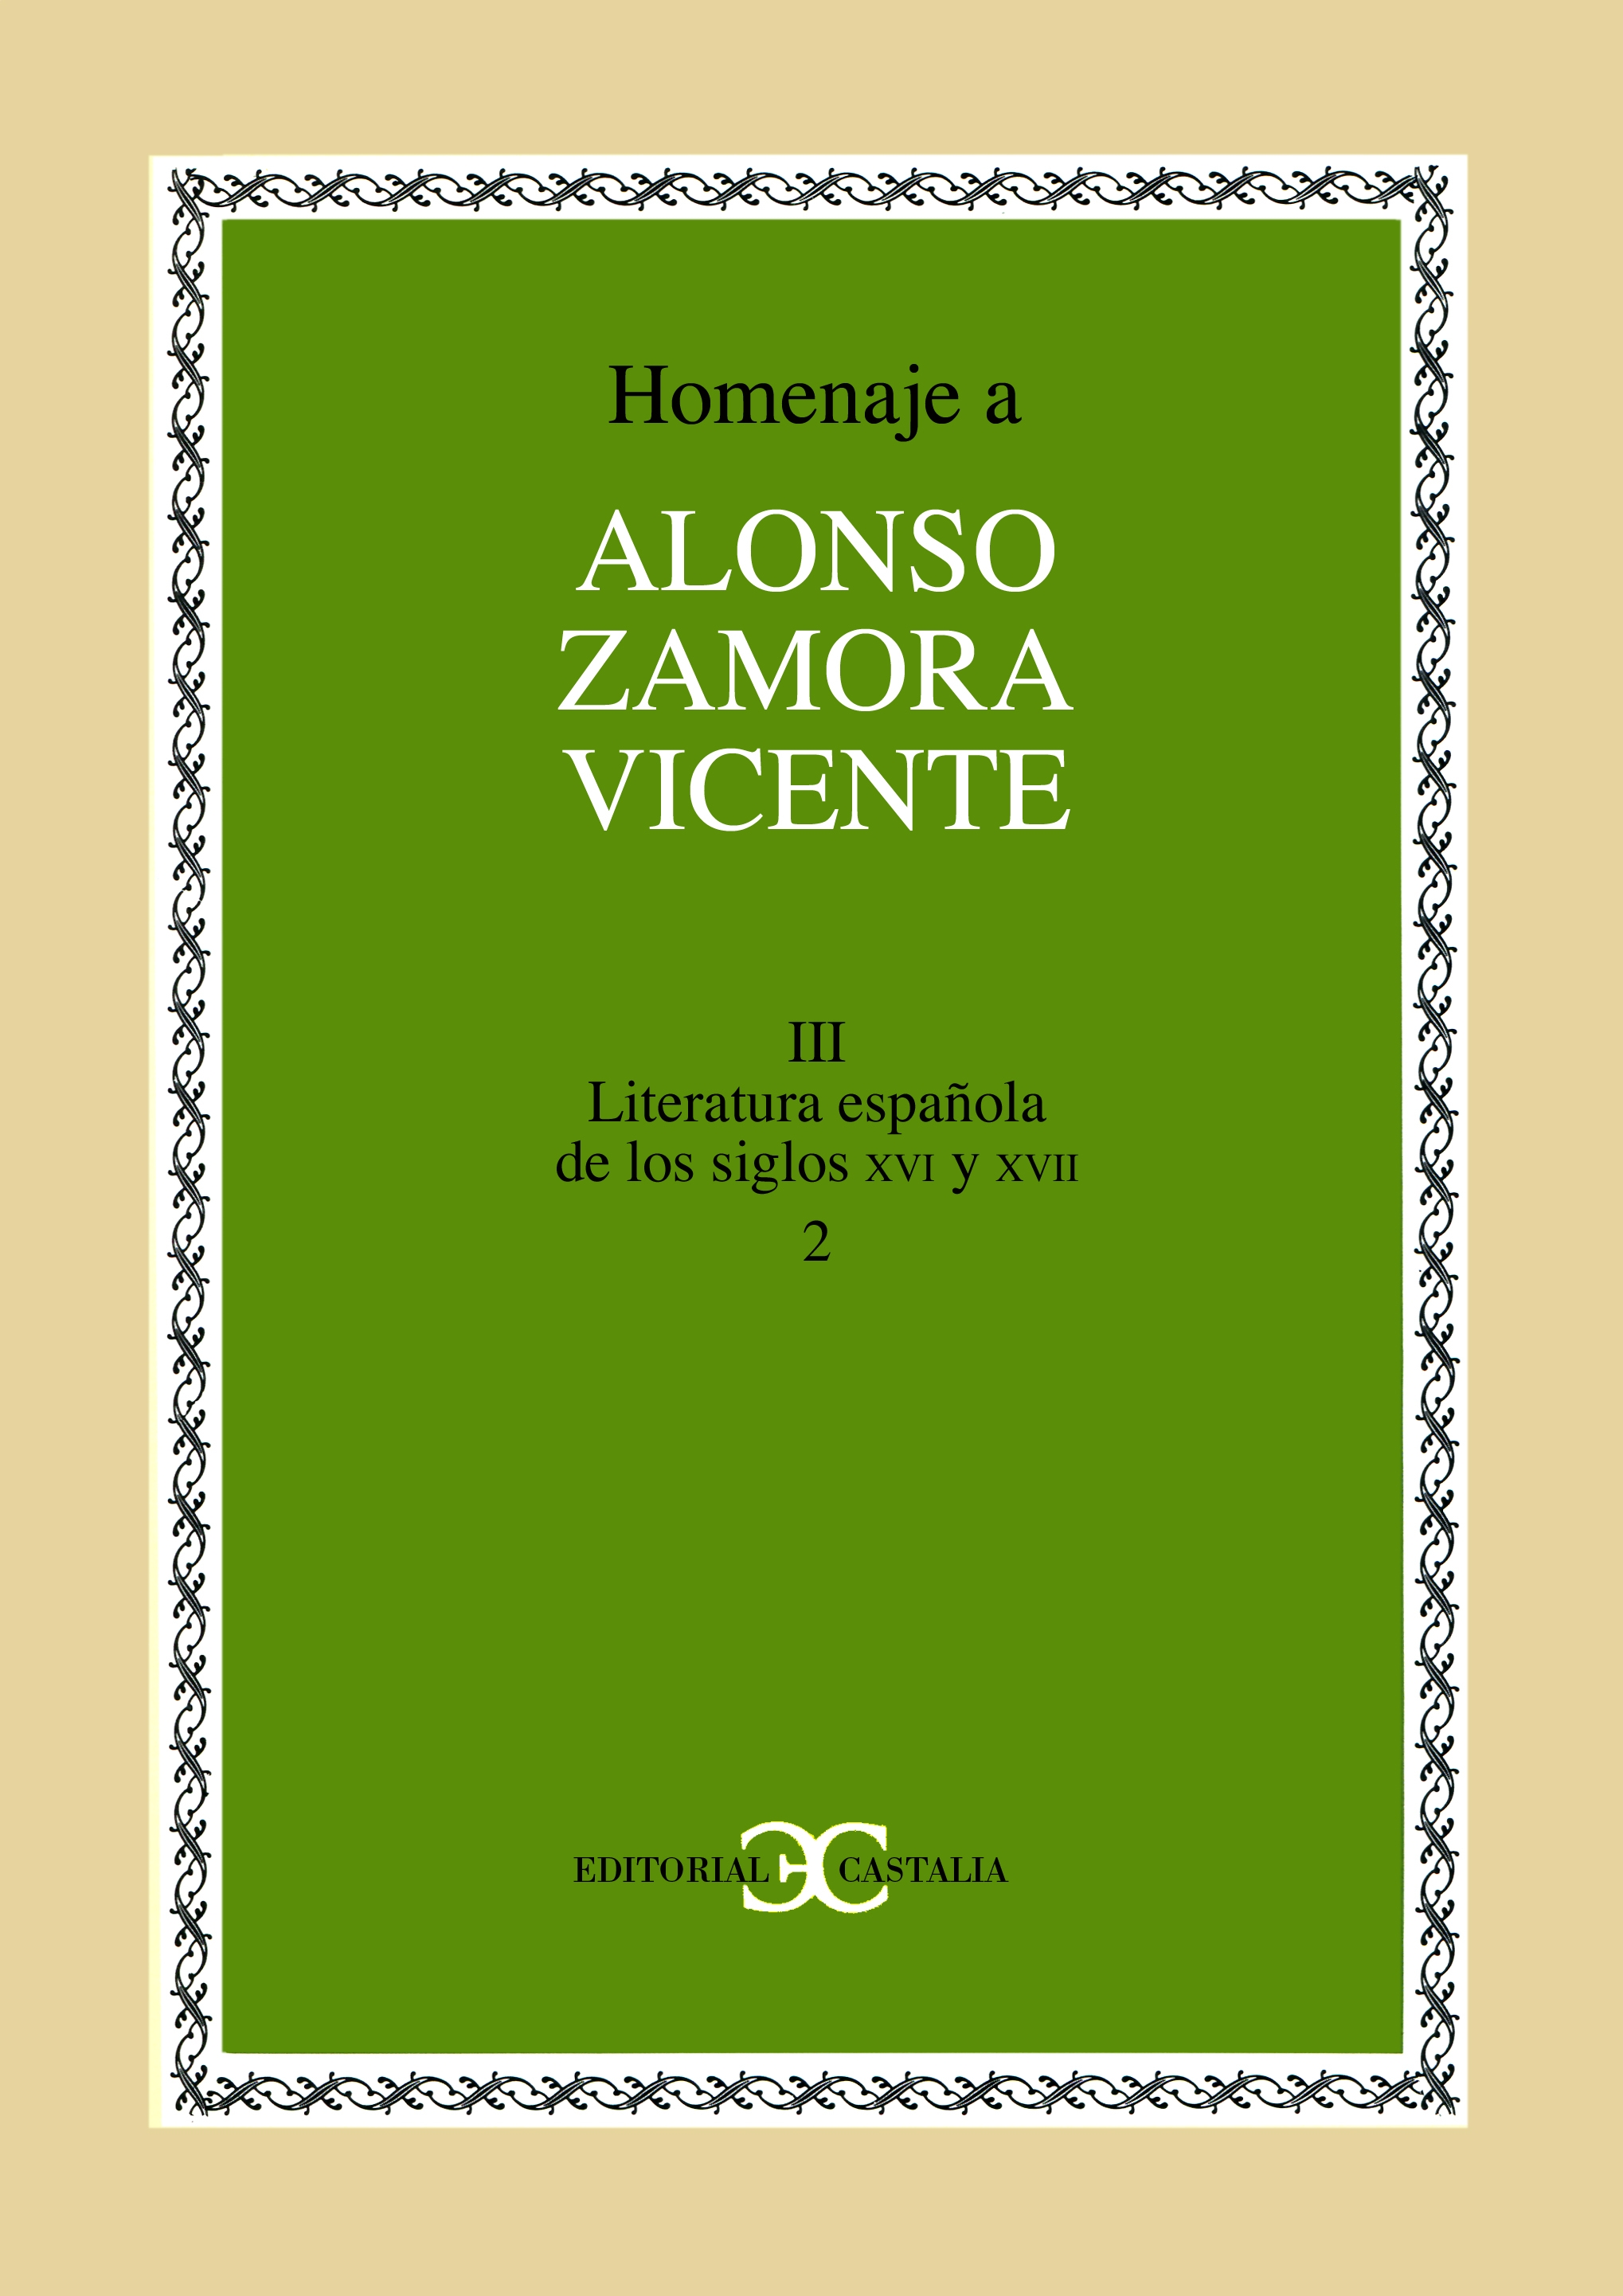 Homenaje a Alonso Zamora Vicente. Volumen III, tomo 2